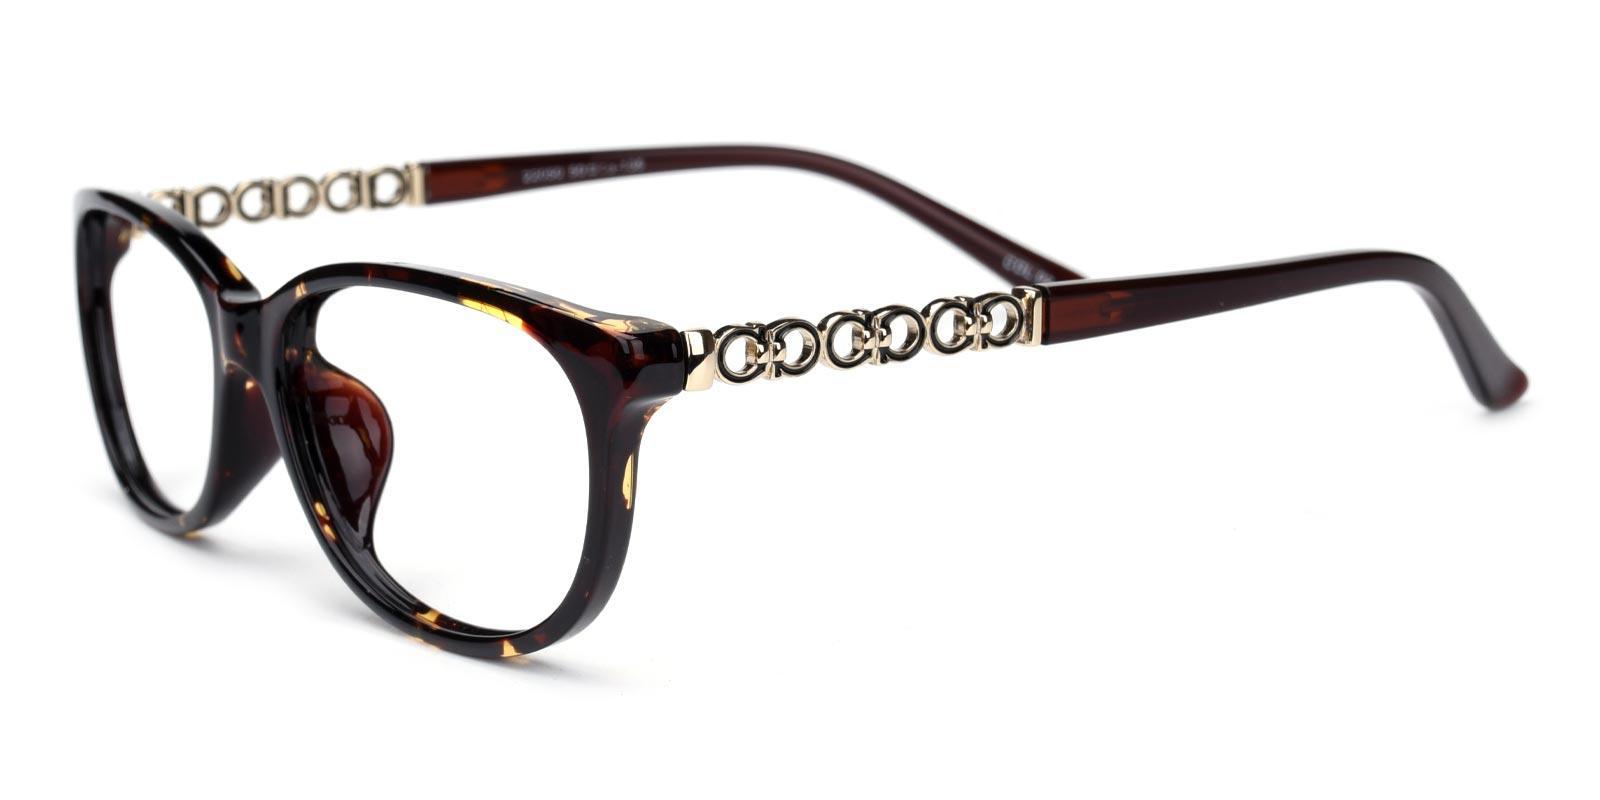 Hilary-Tortoise-Rectangle-TR-Eyeglasses-additional1